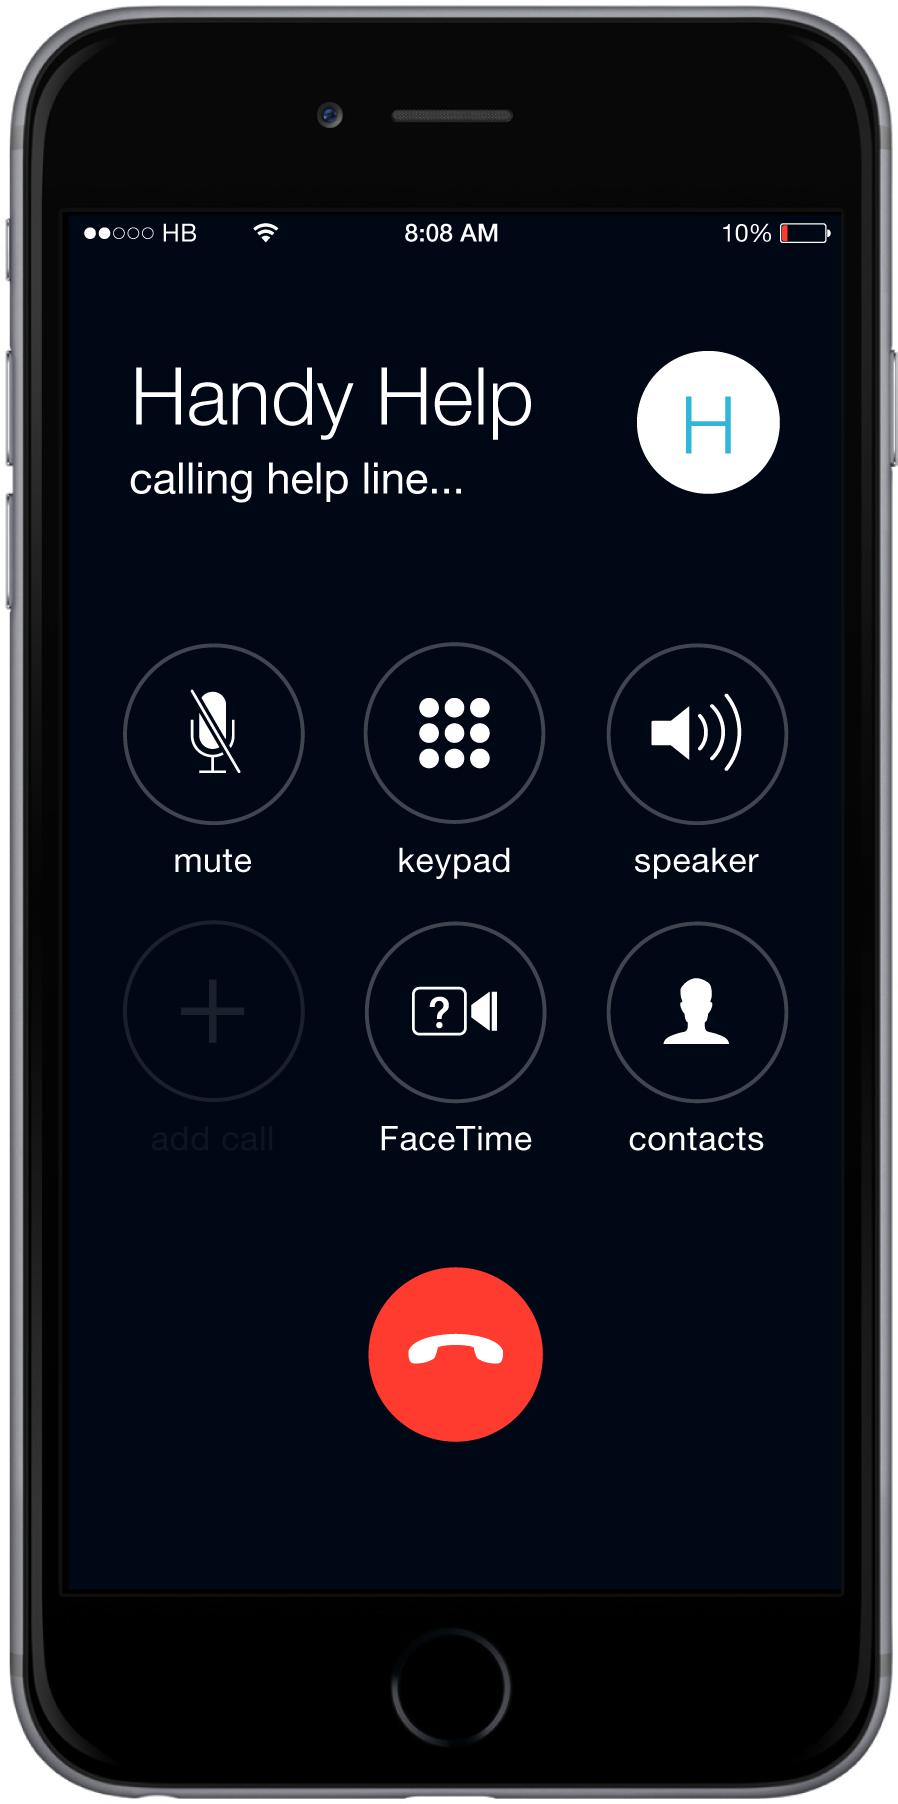 Call the Handy Help Line